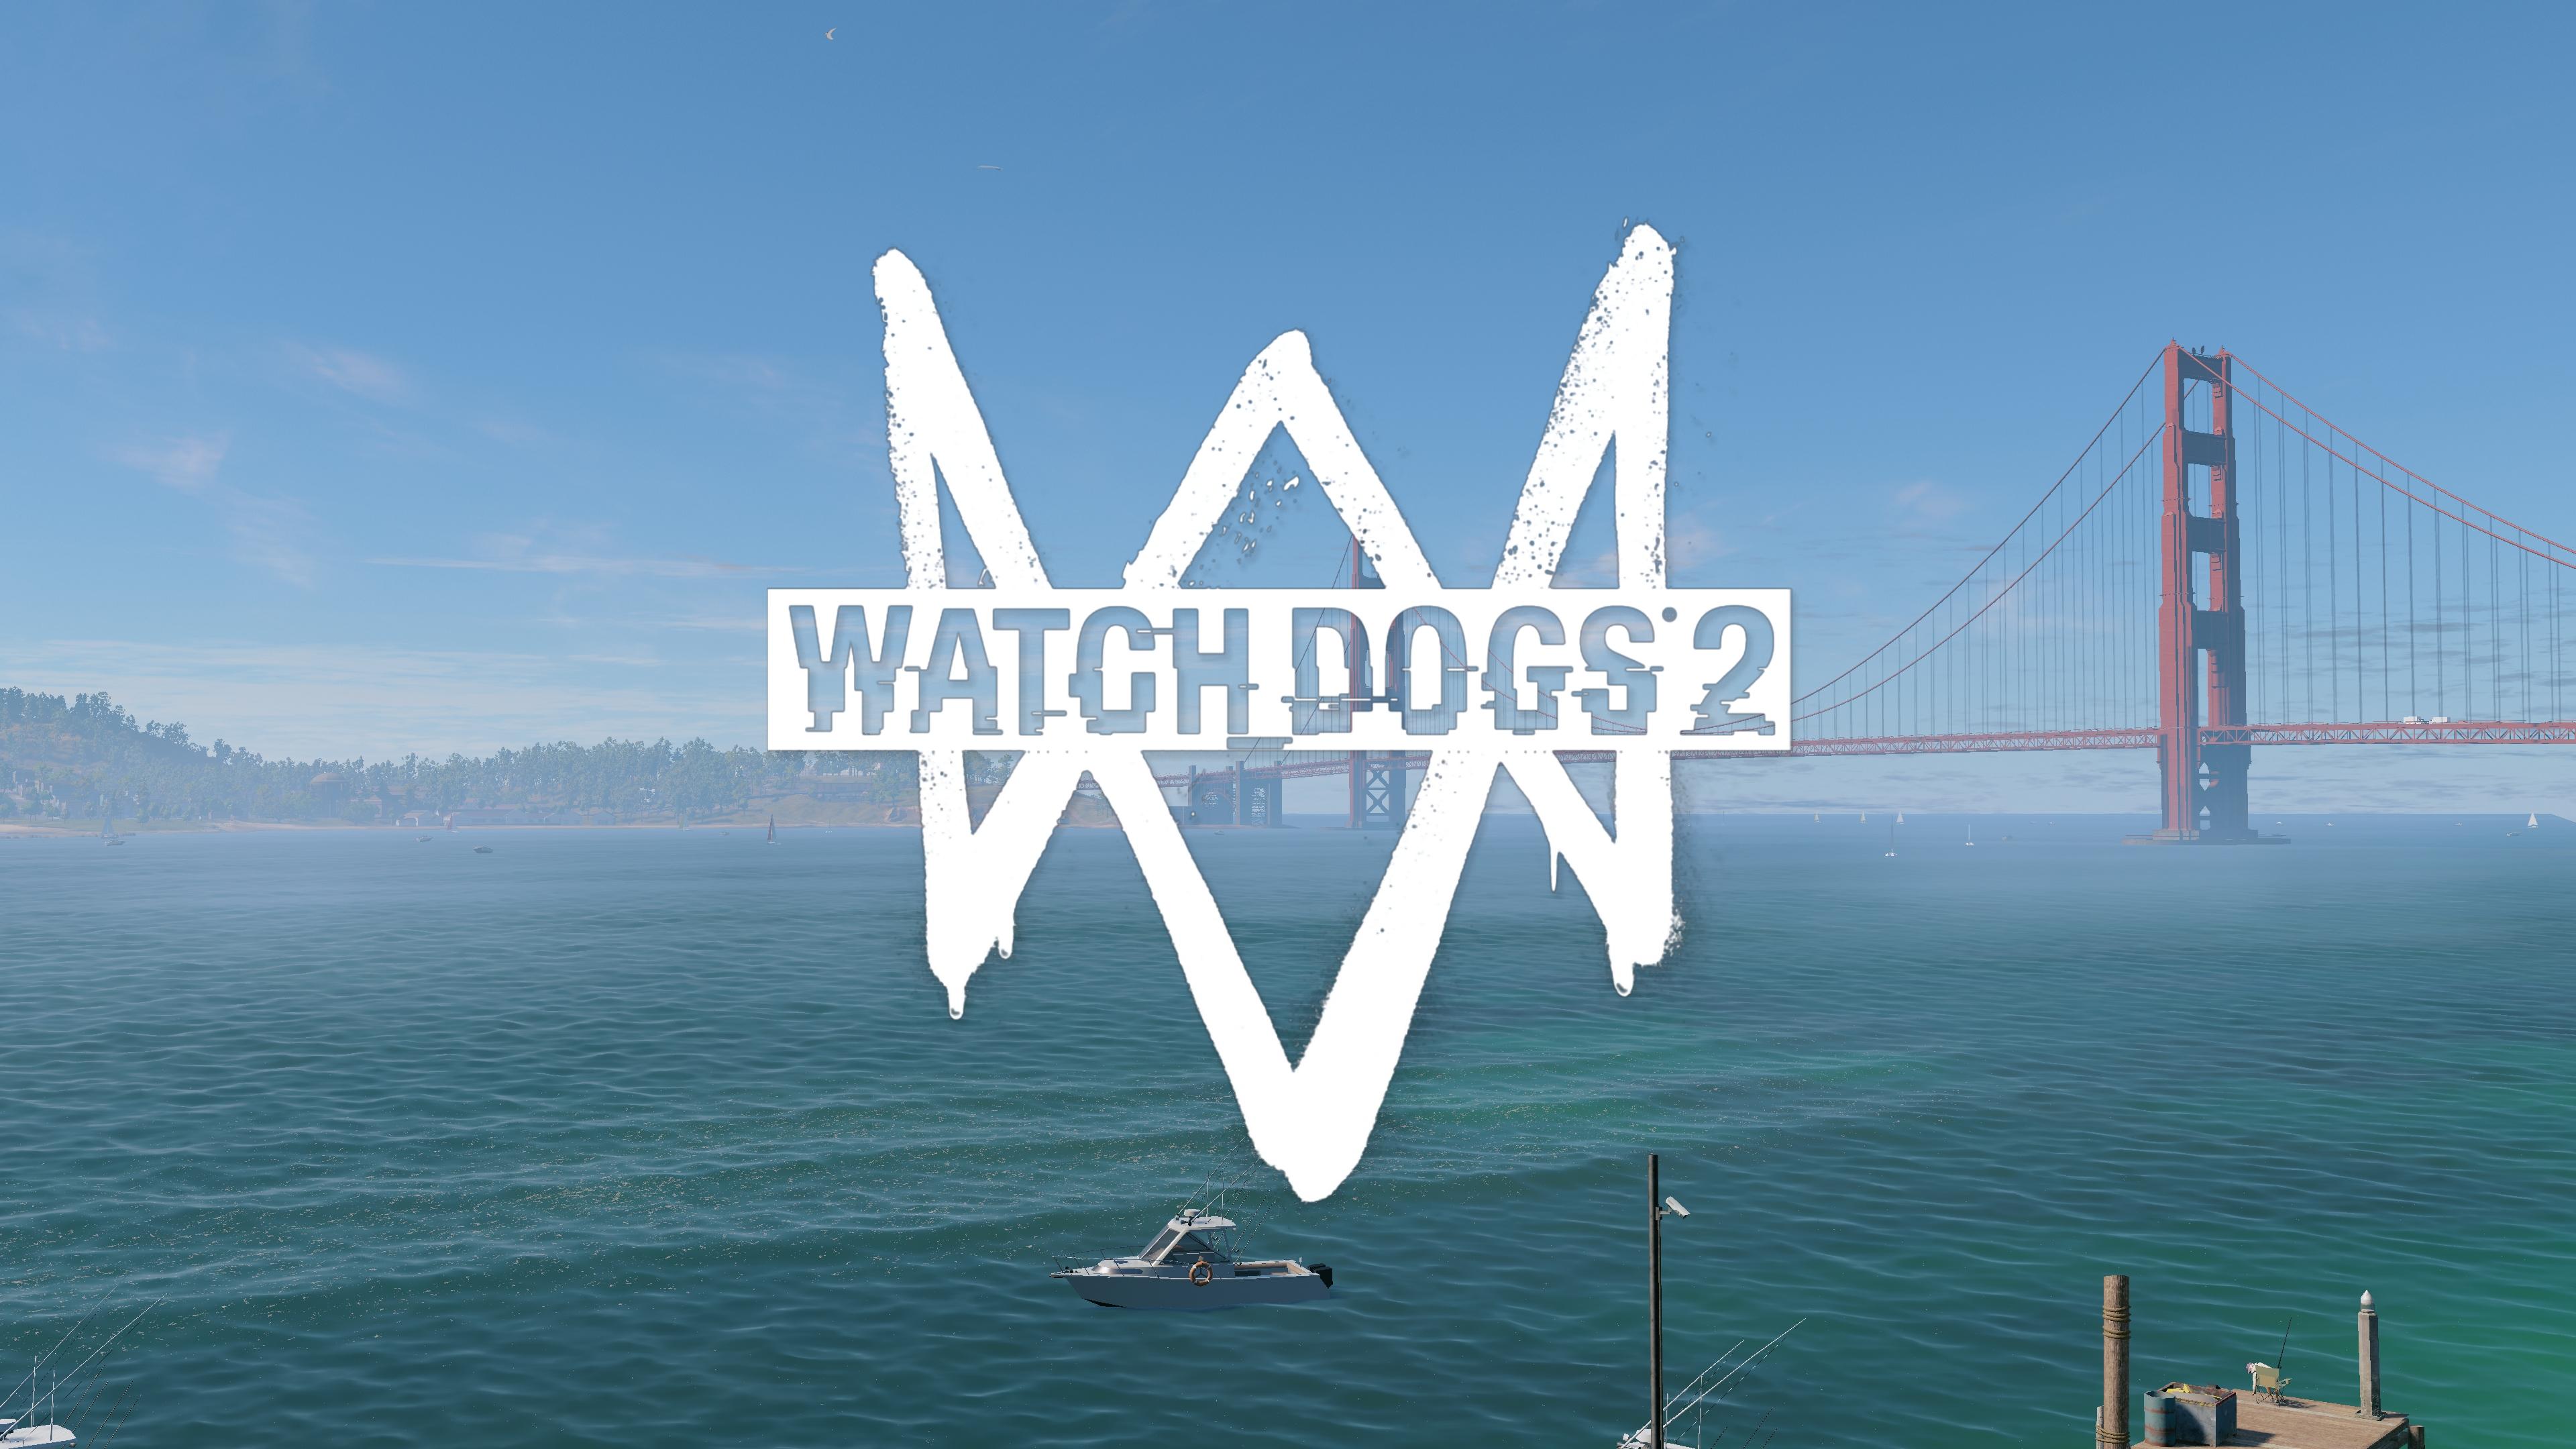 Watch Dogs 2 4k Ultra Hd Wallpaper Background Image 3840x2160